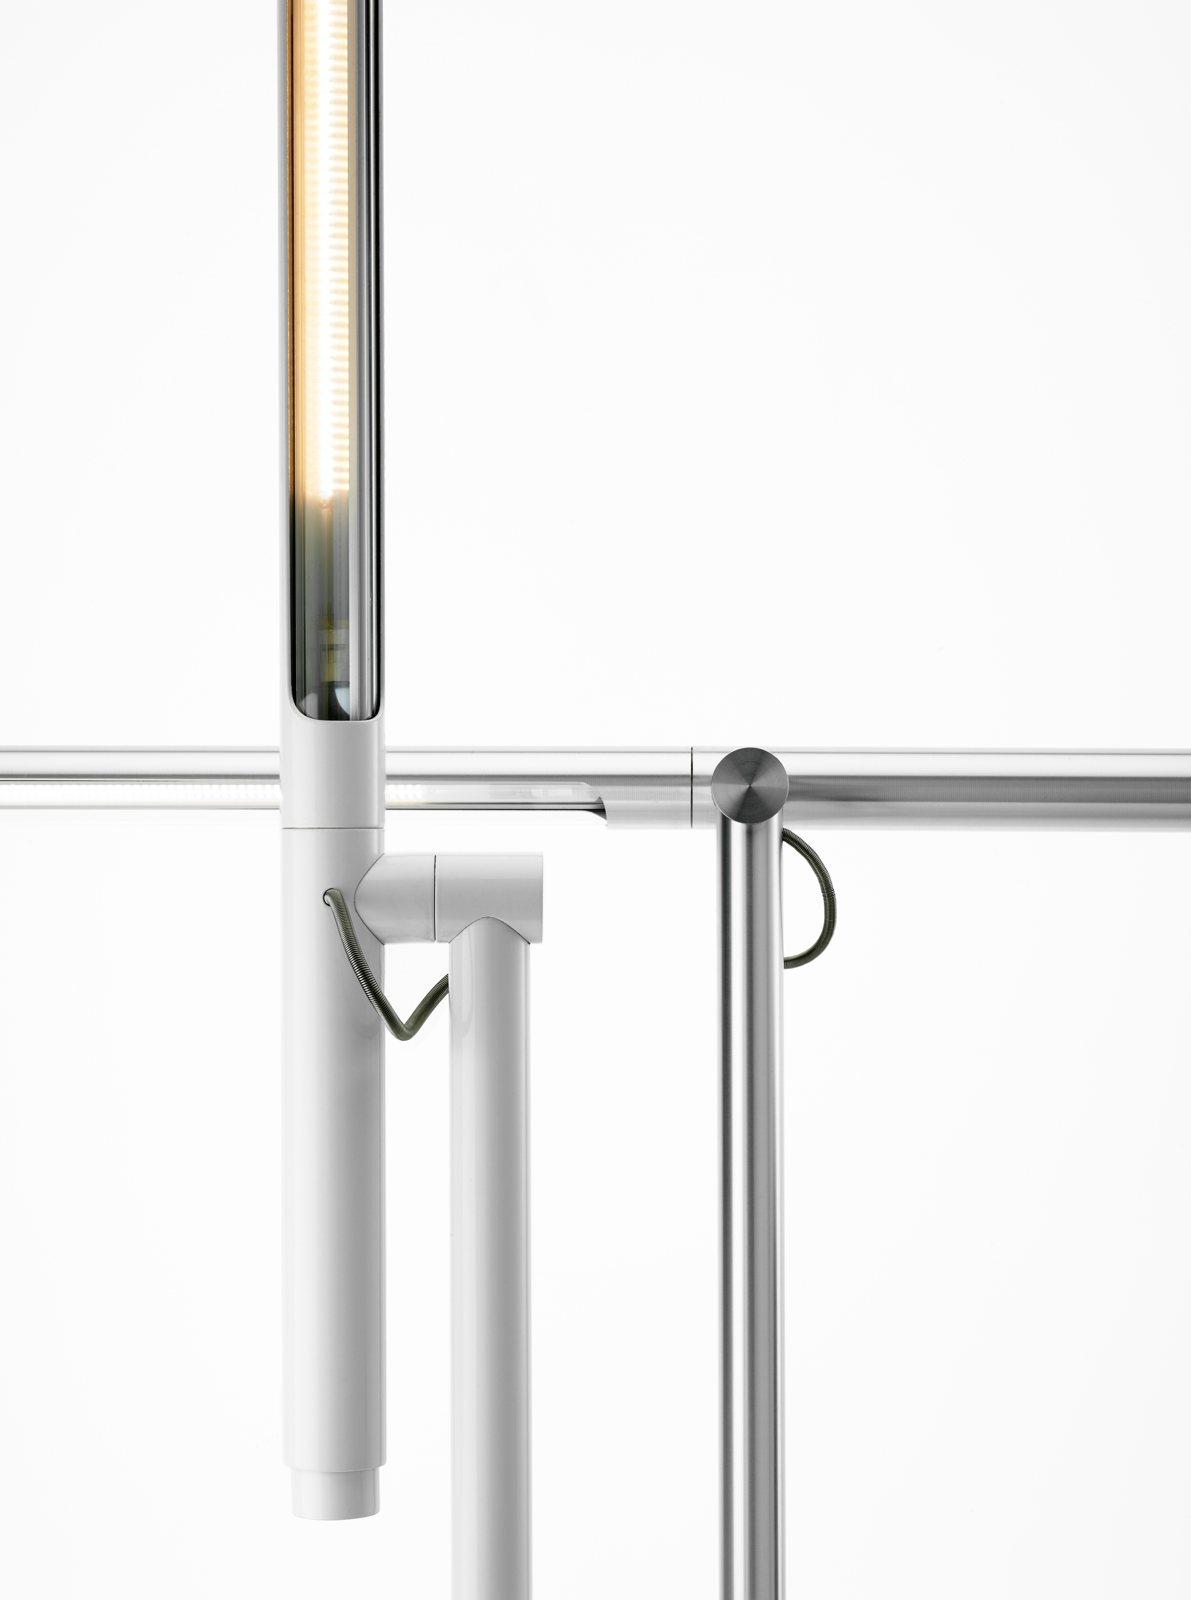 Brazo Floor Lamp by Pablo Pardo for Pablo | UP interiors